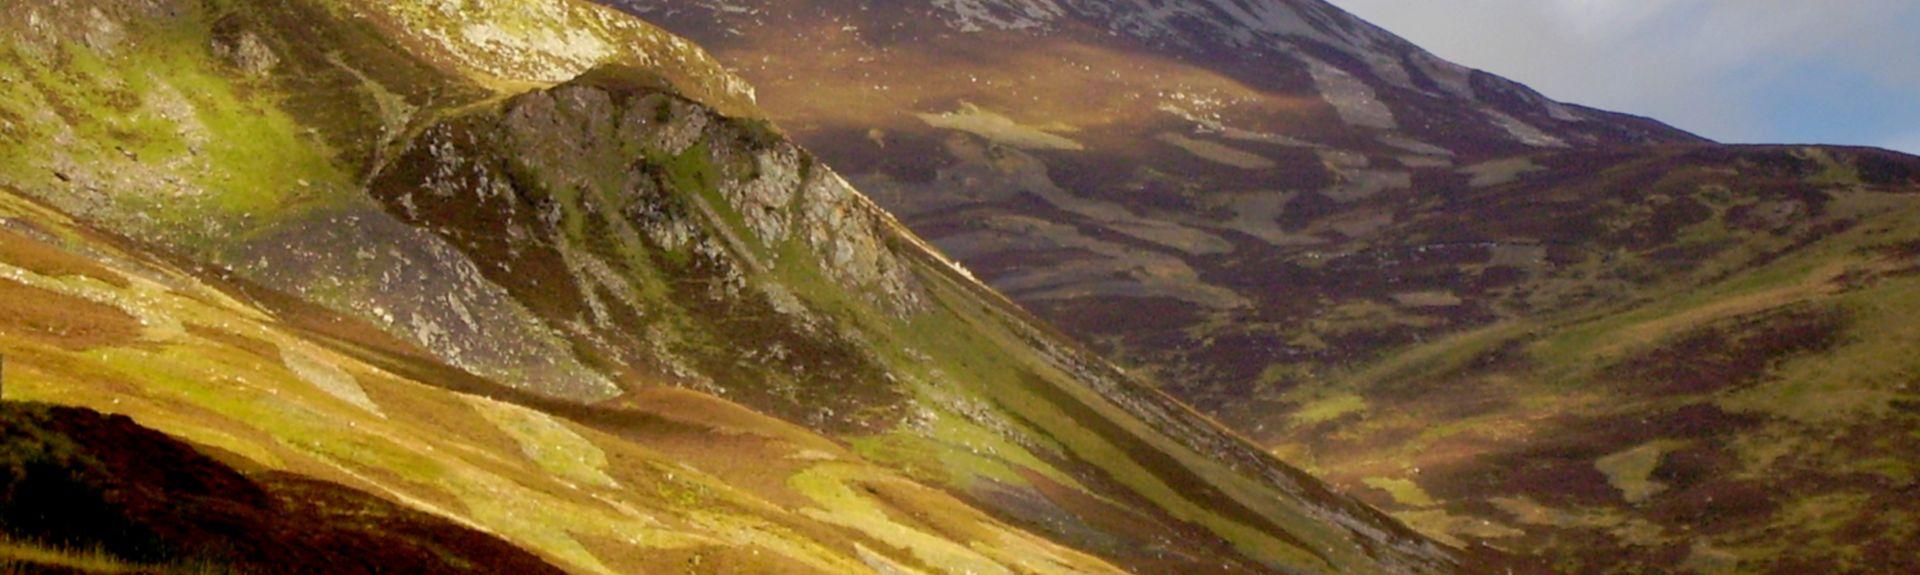 Kirriemuir, Scotland, United Kingdom